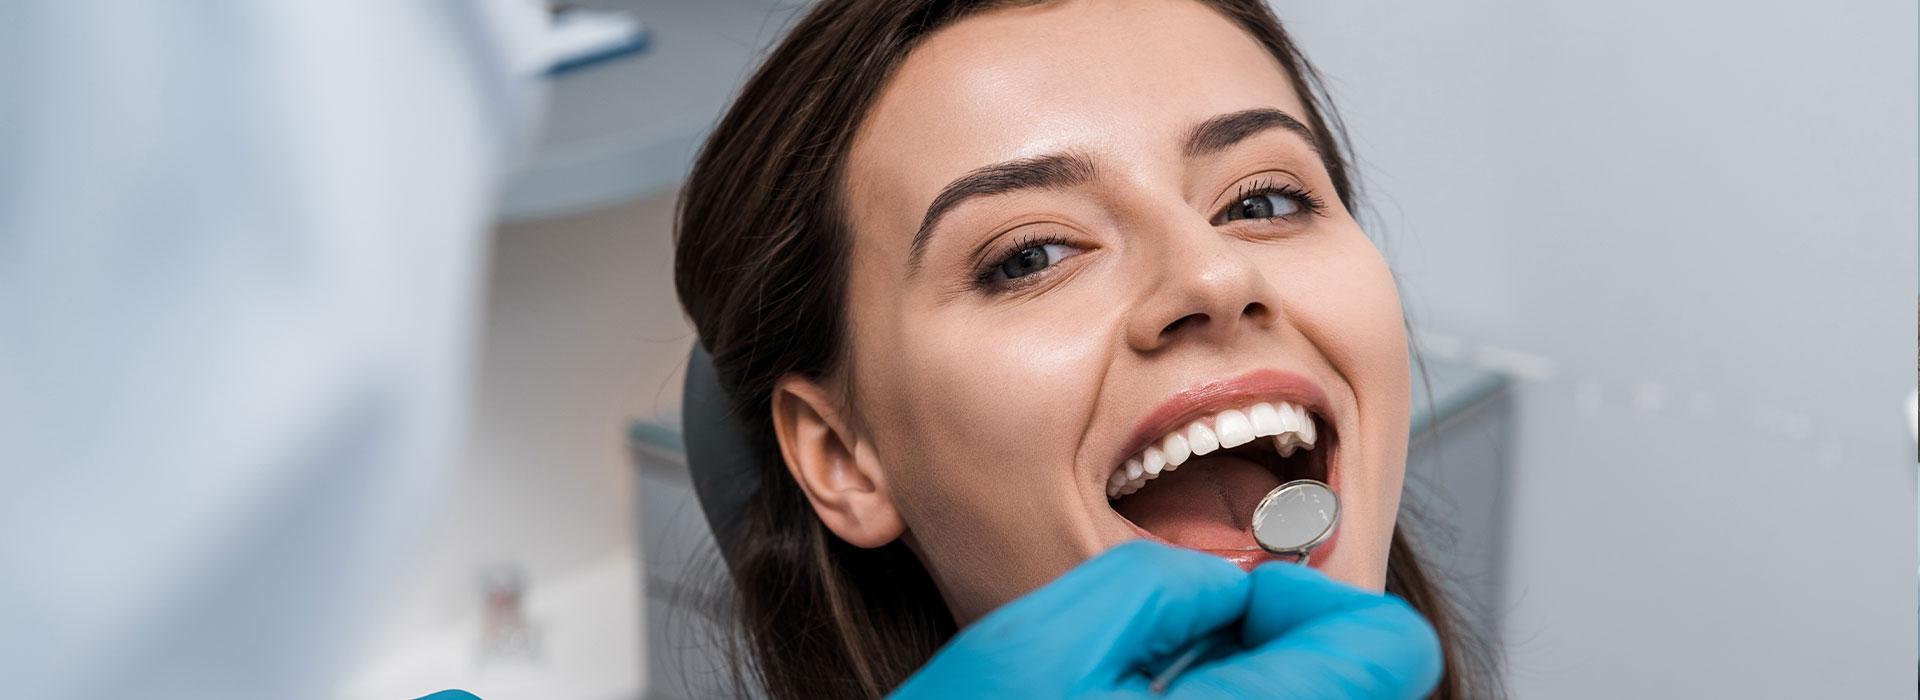 A beautiful woman is having dental checkup